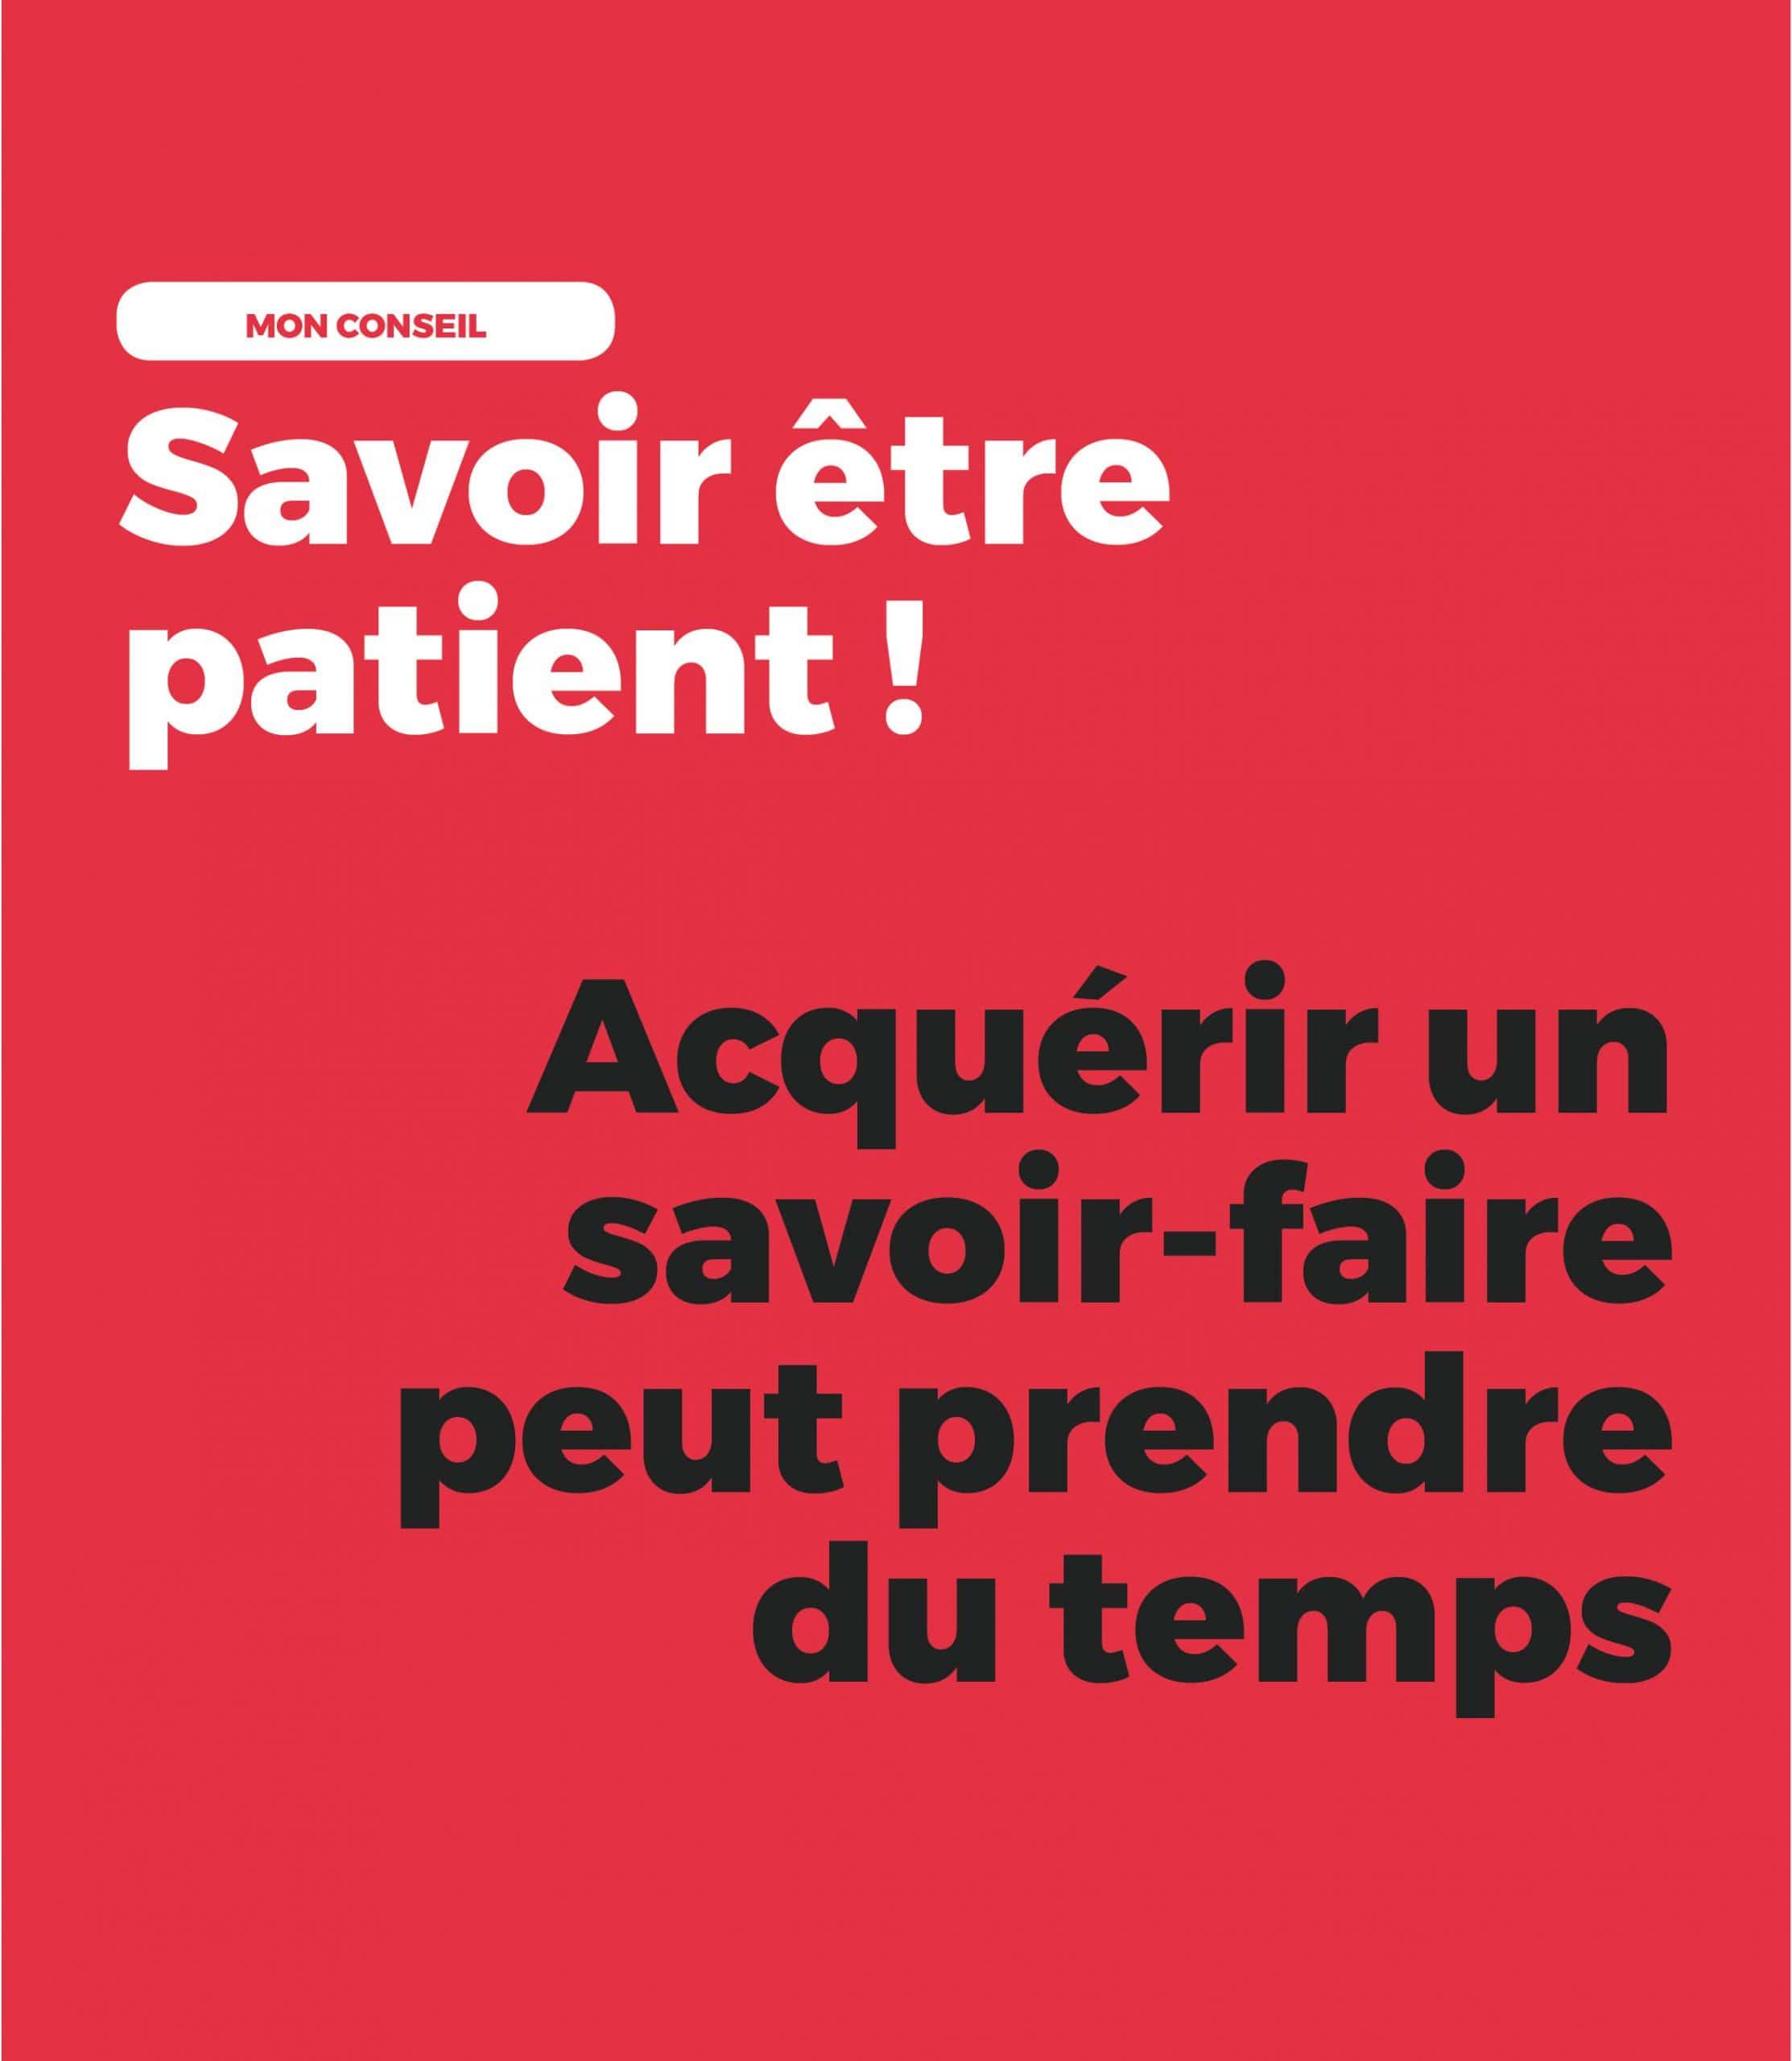 Conseil Laurent